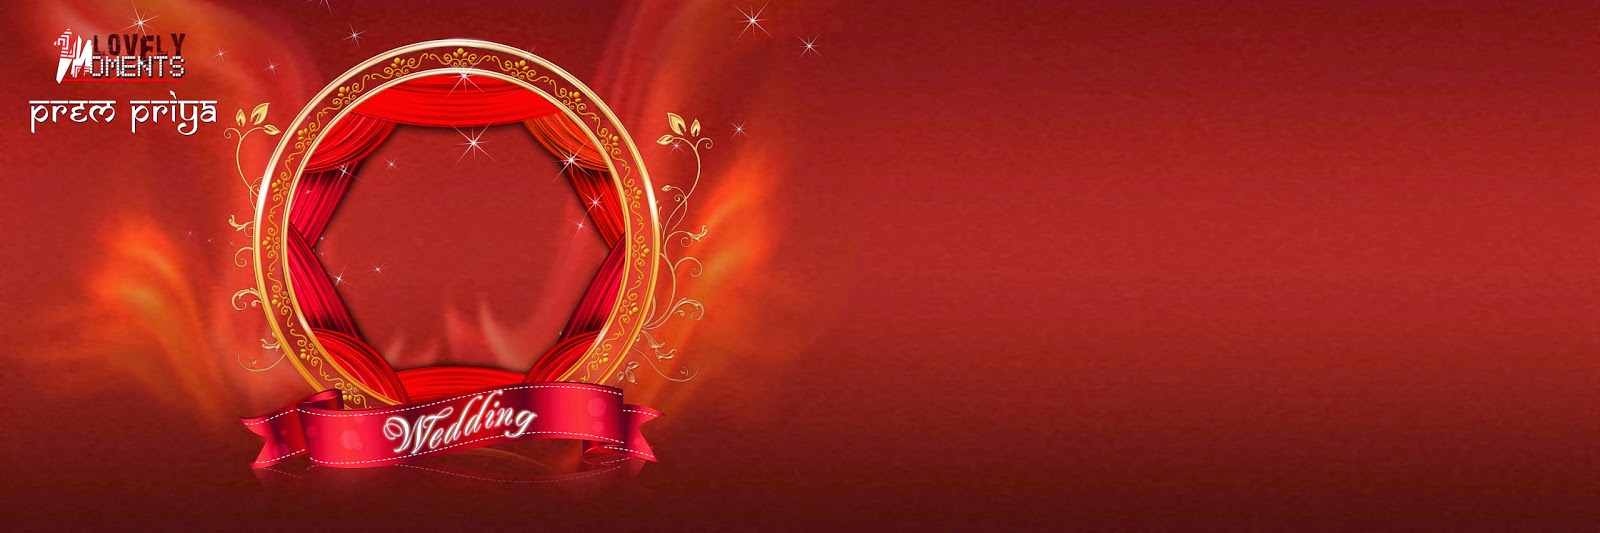 Amazoncom: The Best Of Sade: Sade: MP3 Downloads